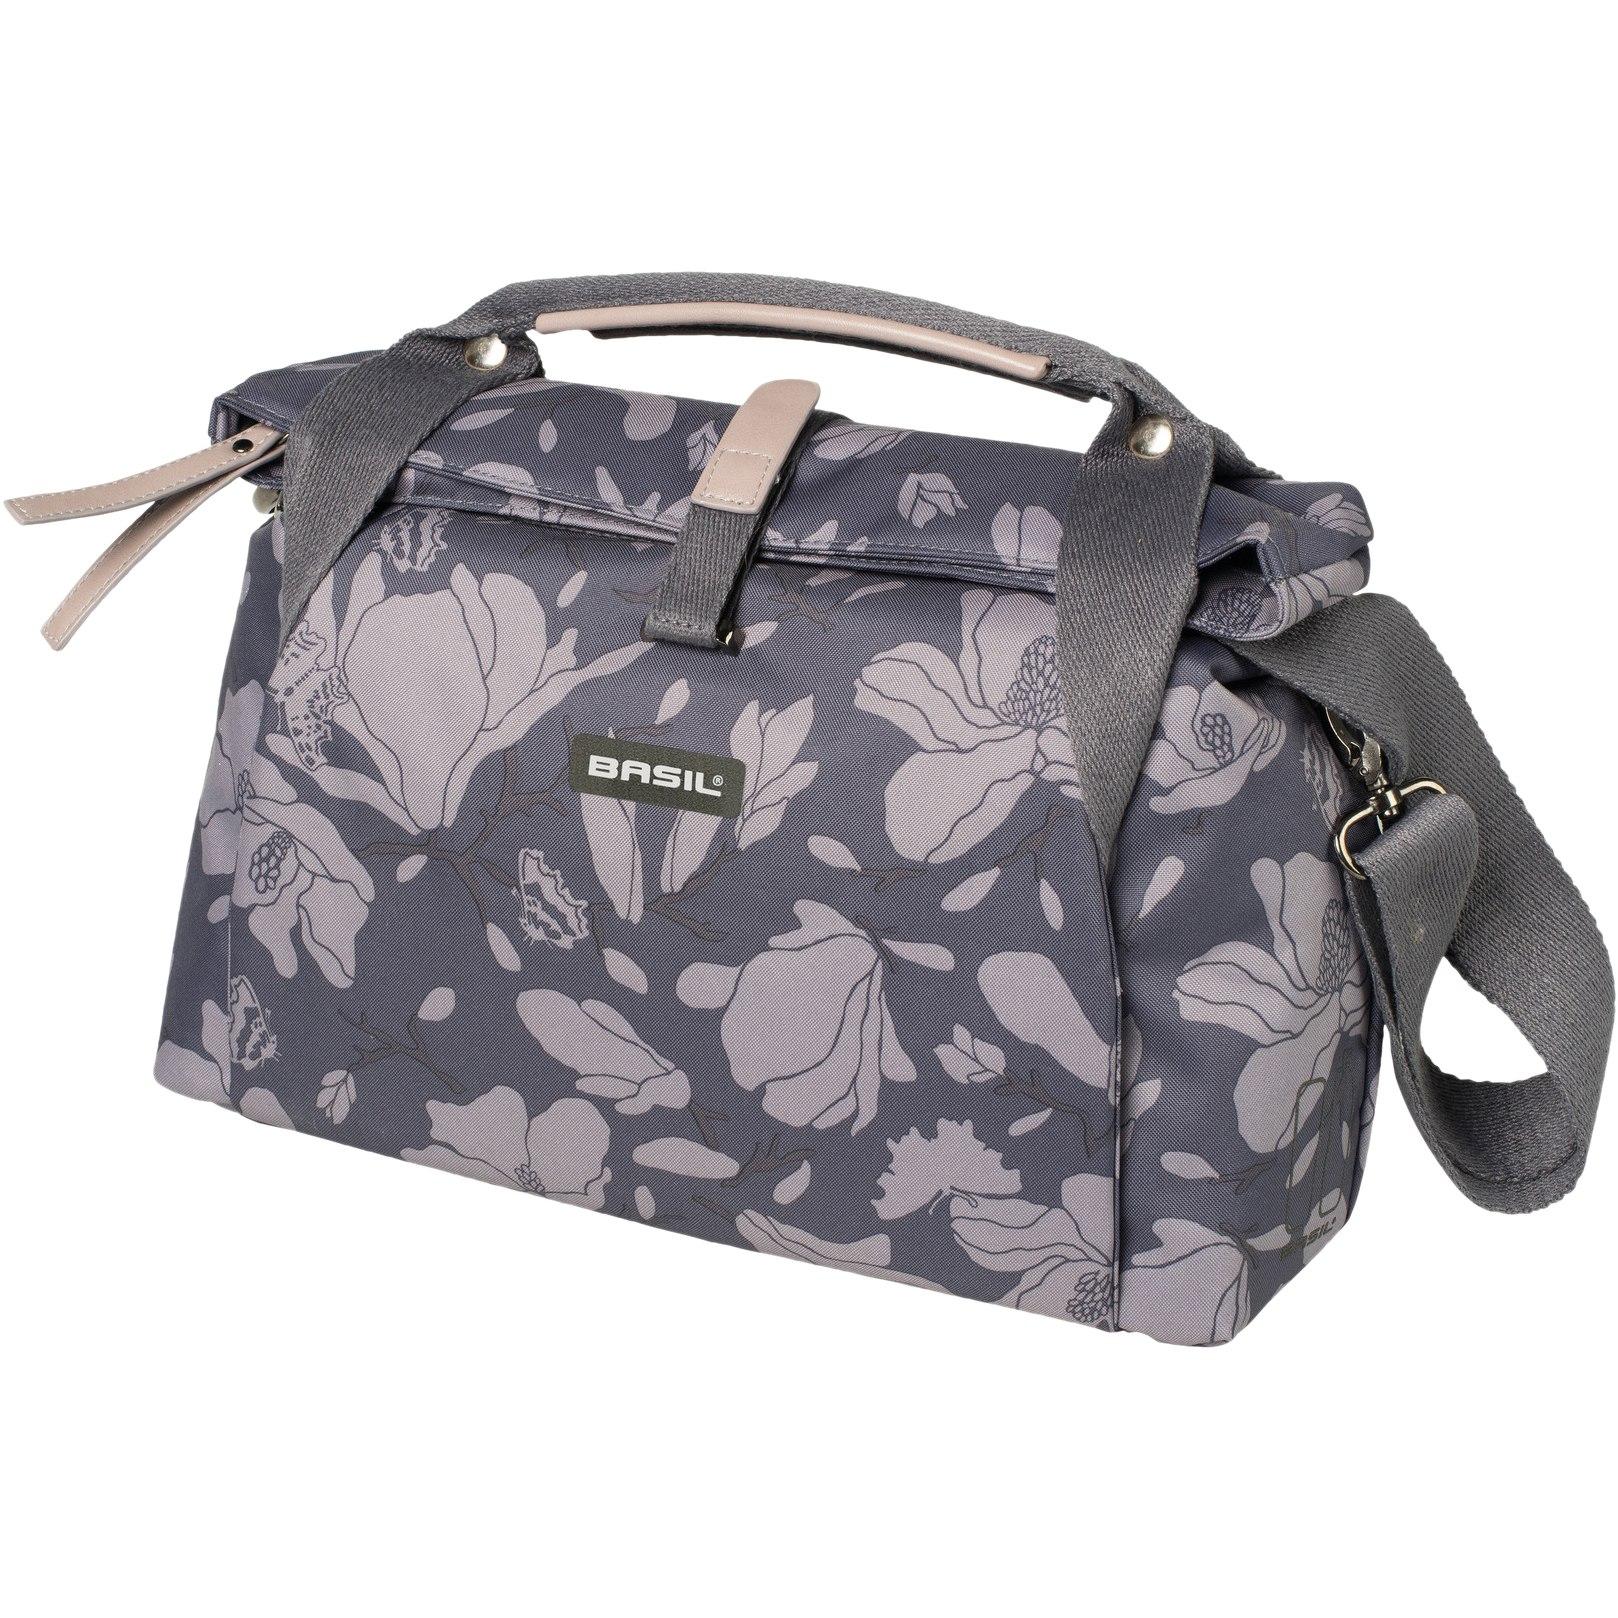 Basil Magnolia City Bag - Handlebar Bag - blackberry